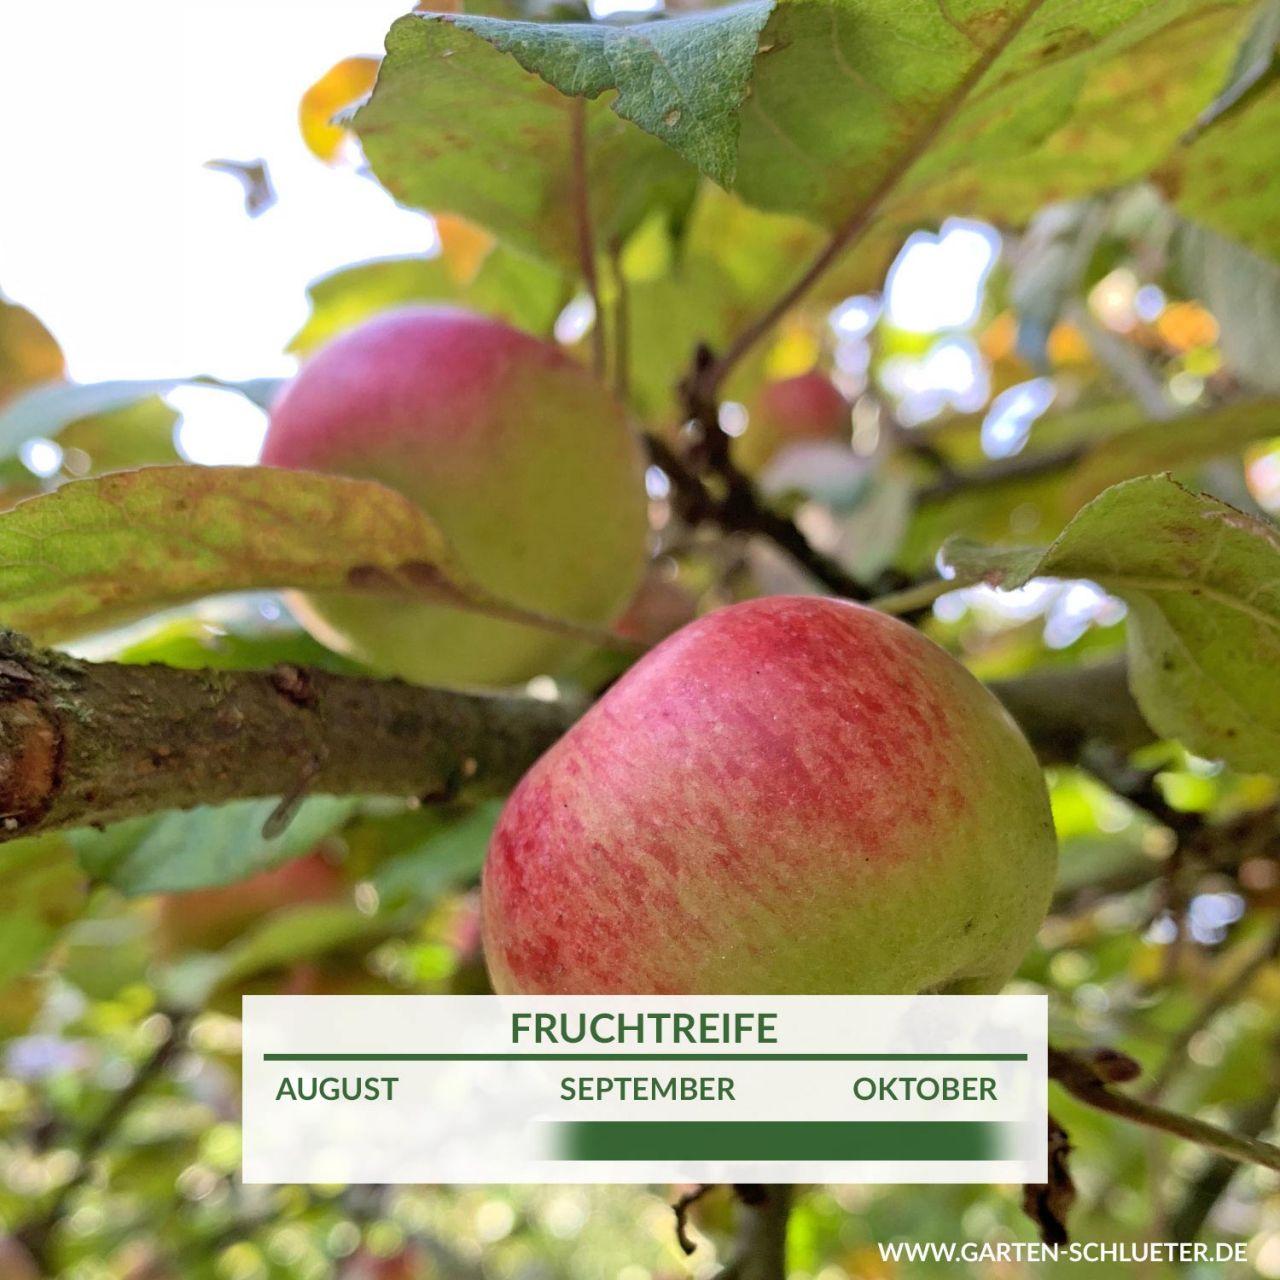 Garten-Schlueter.de: Apfel Prinz Albrecht von Preußen - Herbstapfel